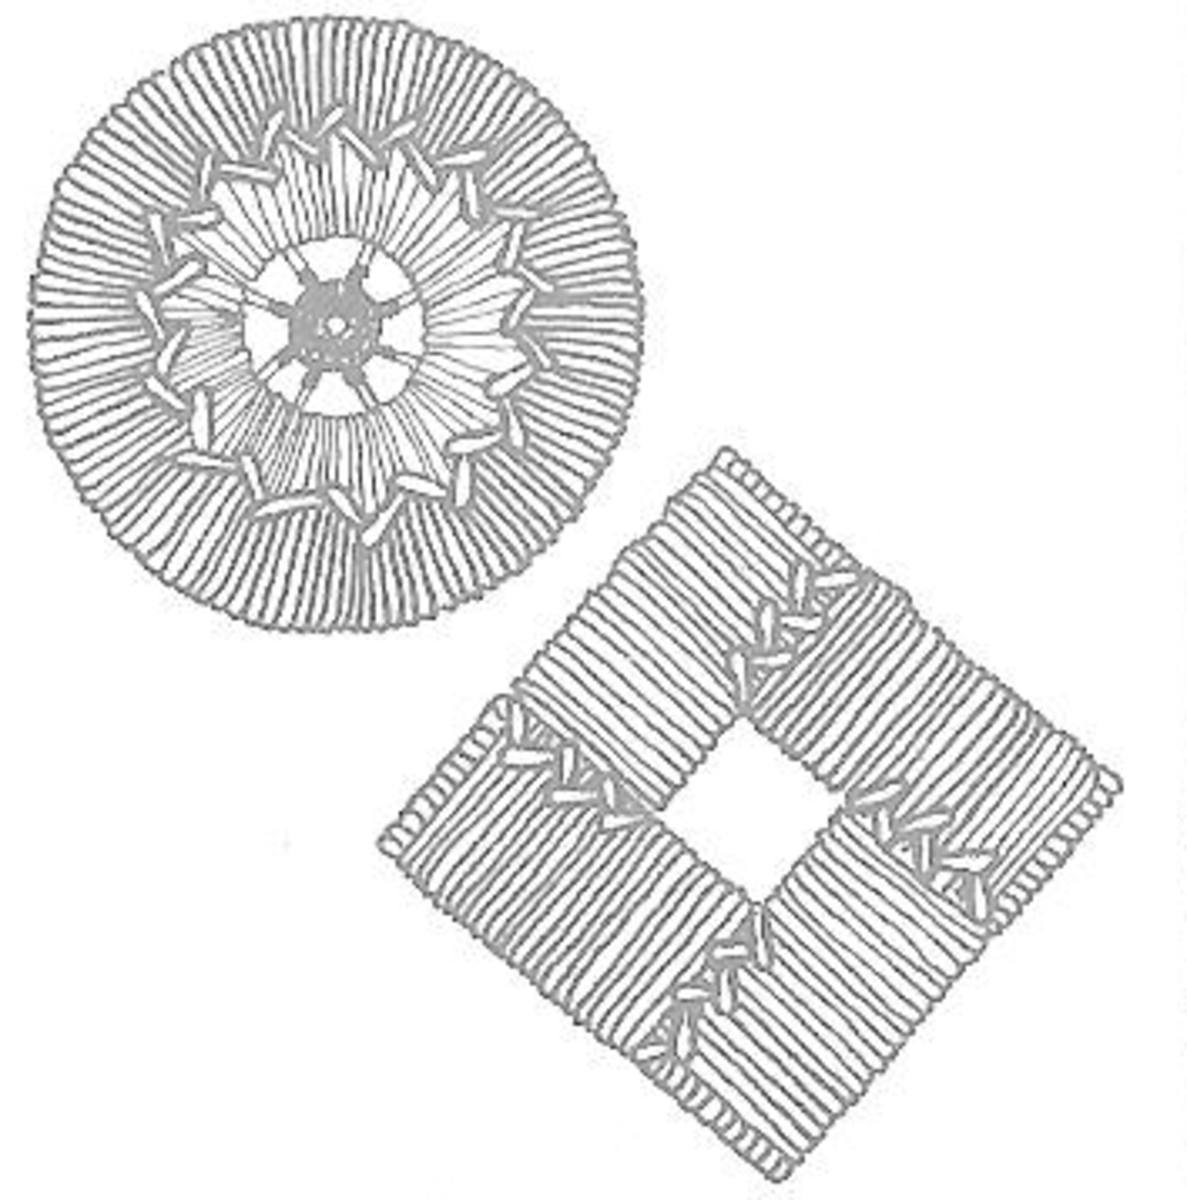 Figure 2 - Two Unusual Mats